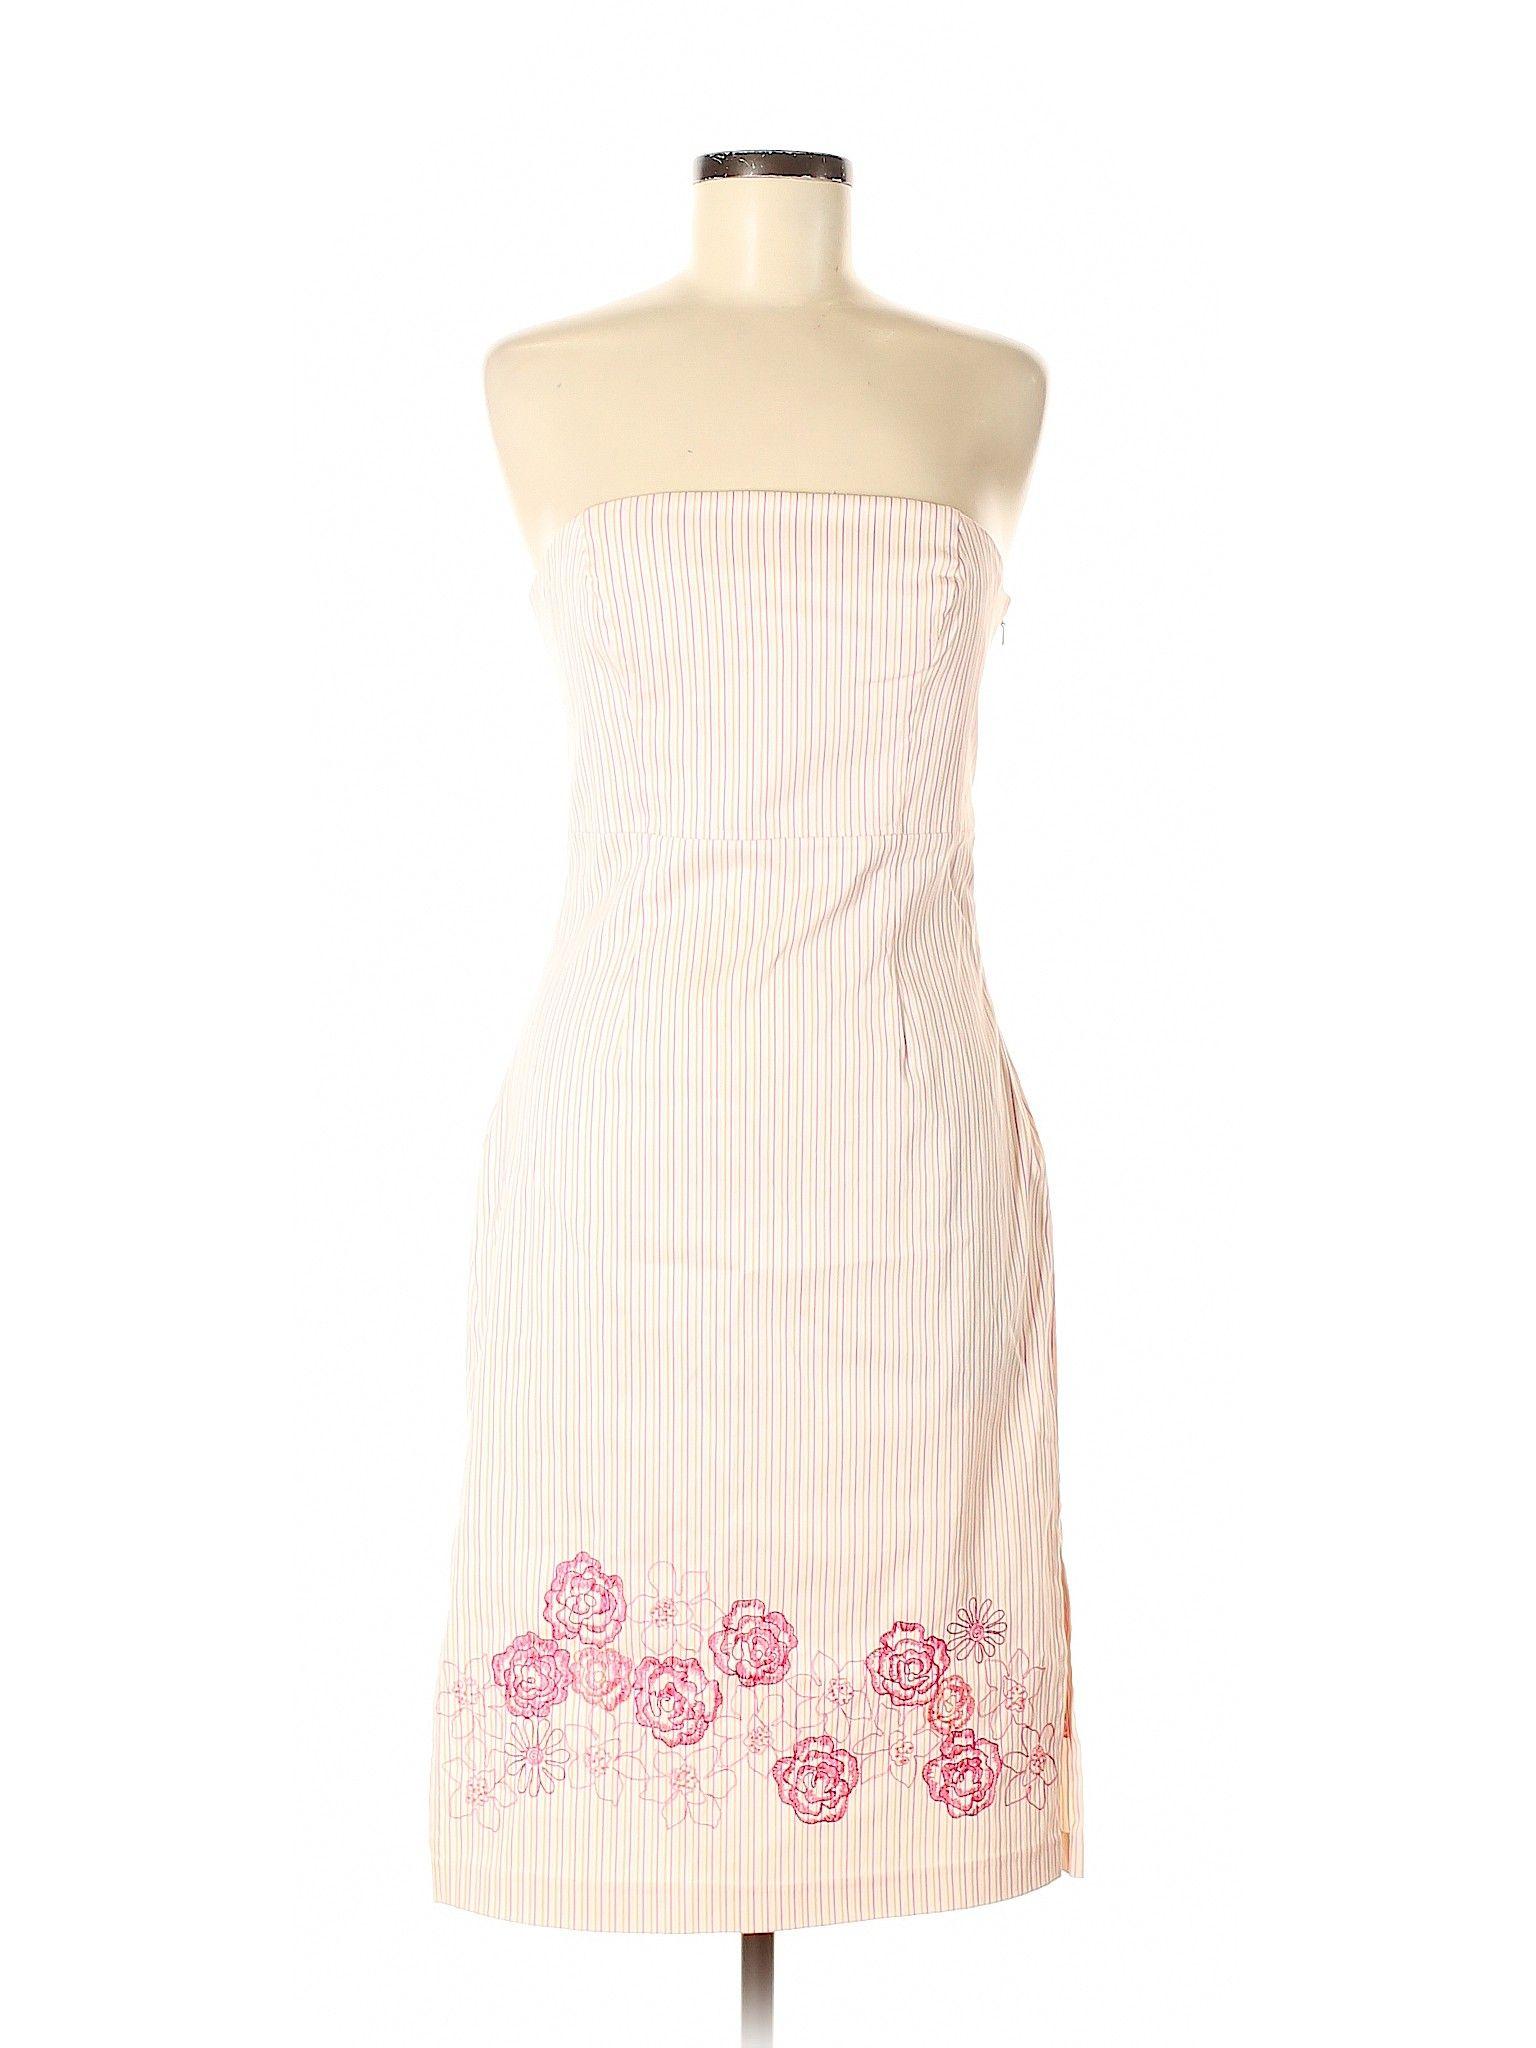 Express Casual Dress Sheath Pink Lace Dresses Used Size 6 Lace Pink Dress